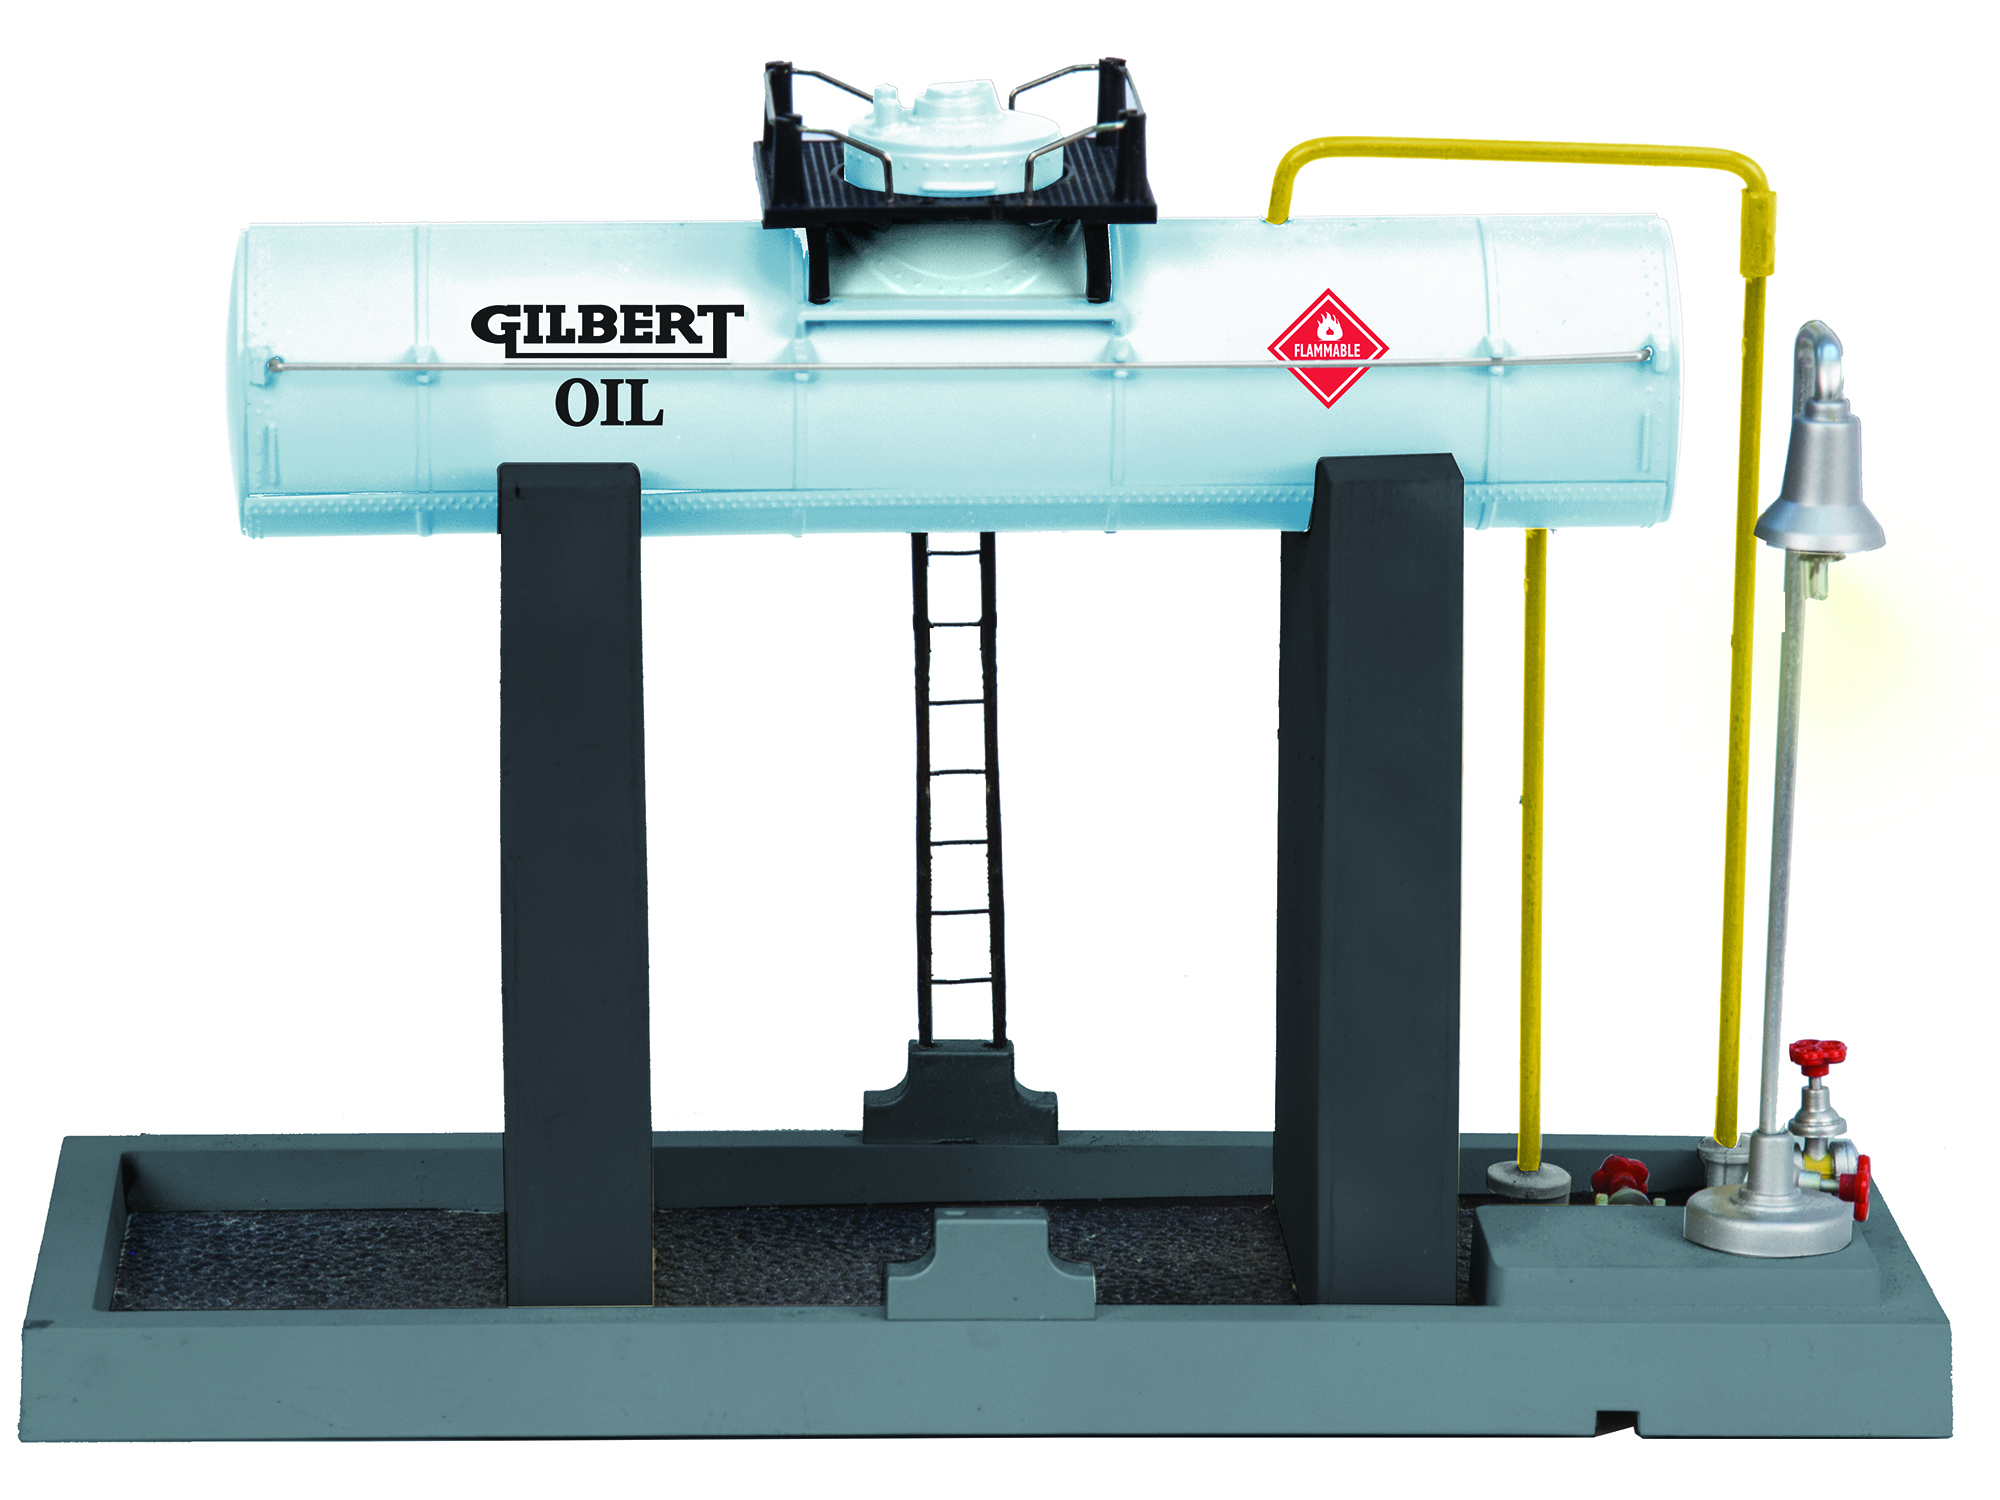 S AF Elevated Gilbert Oil Tank